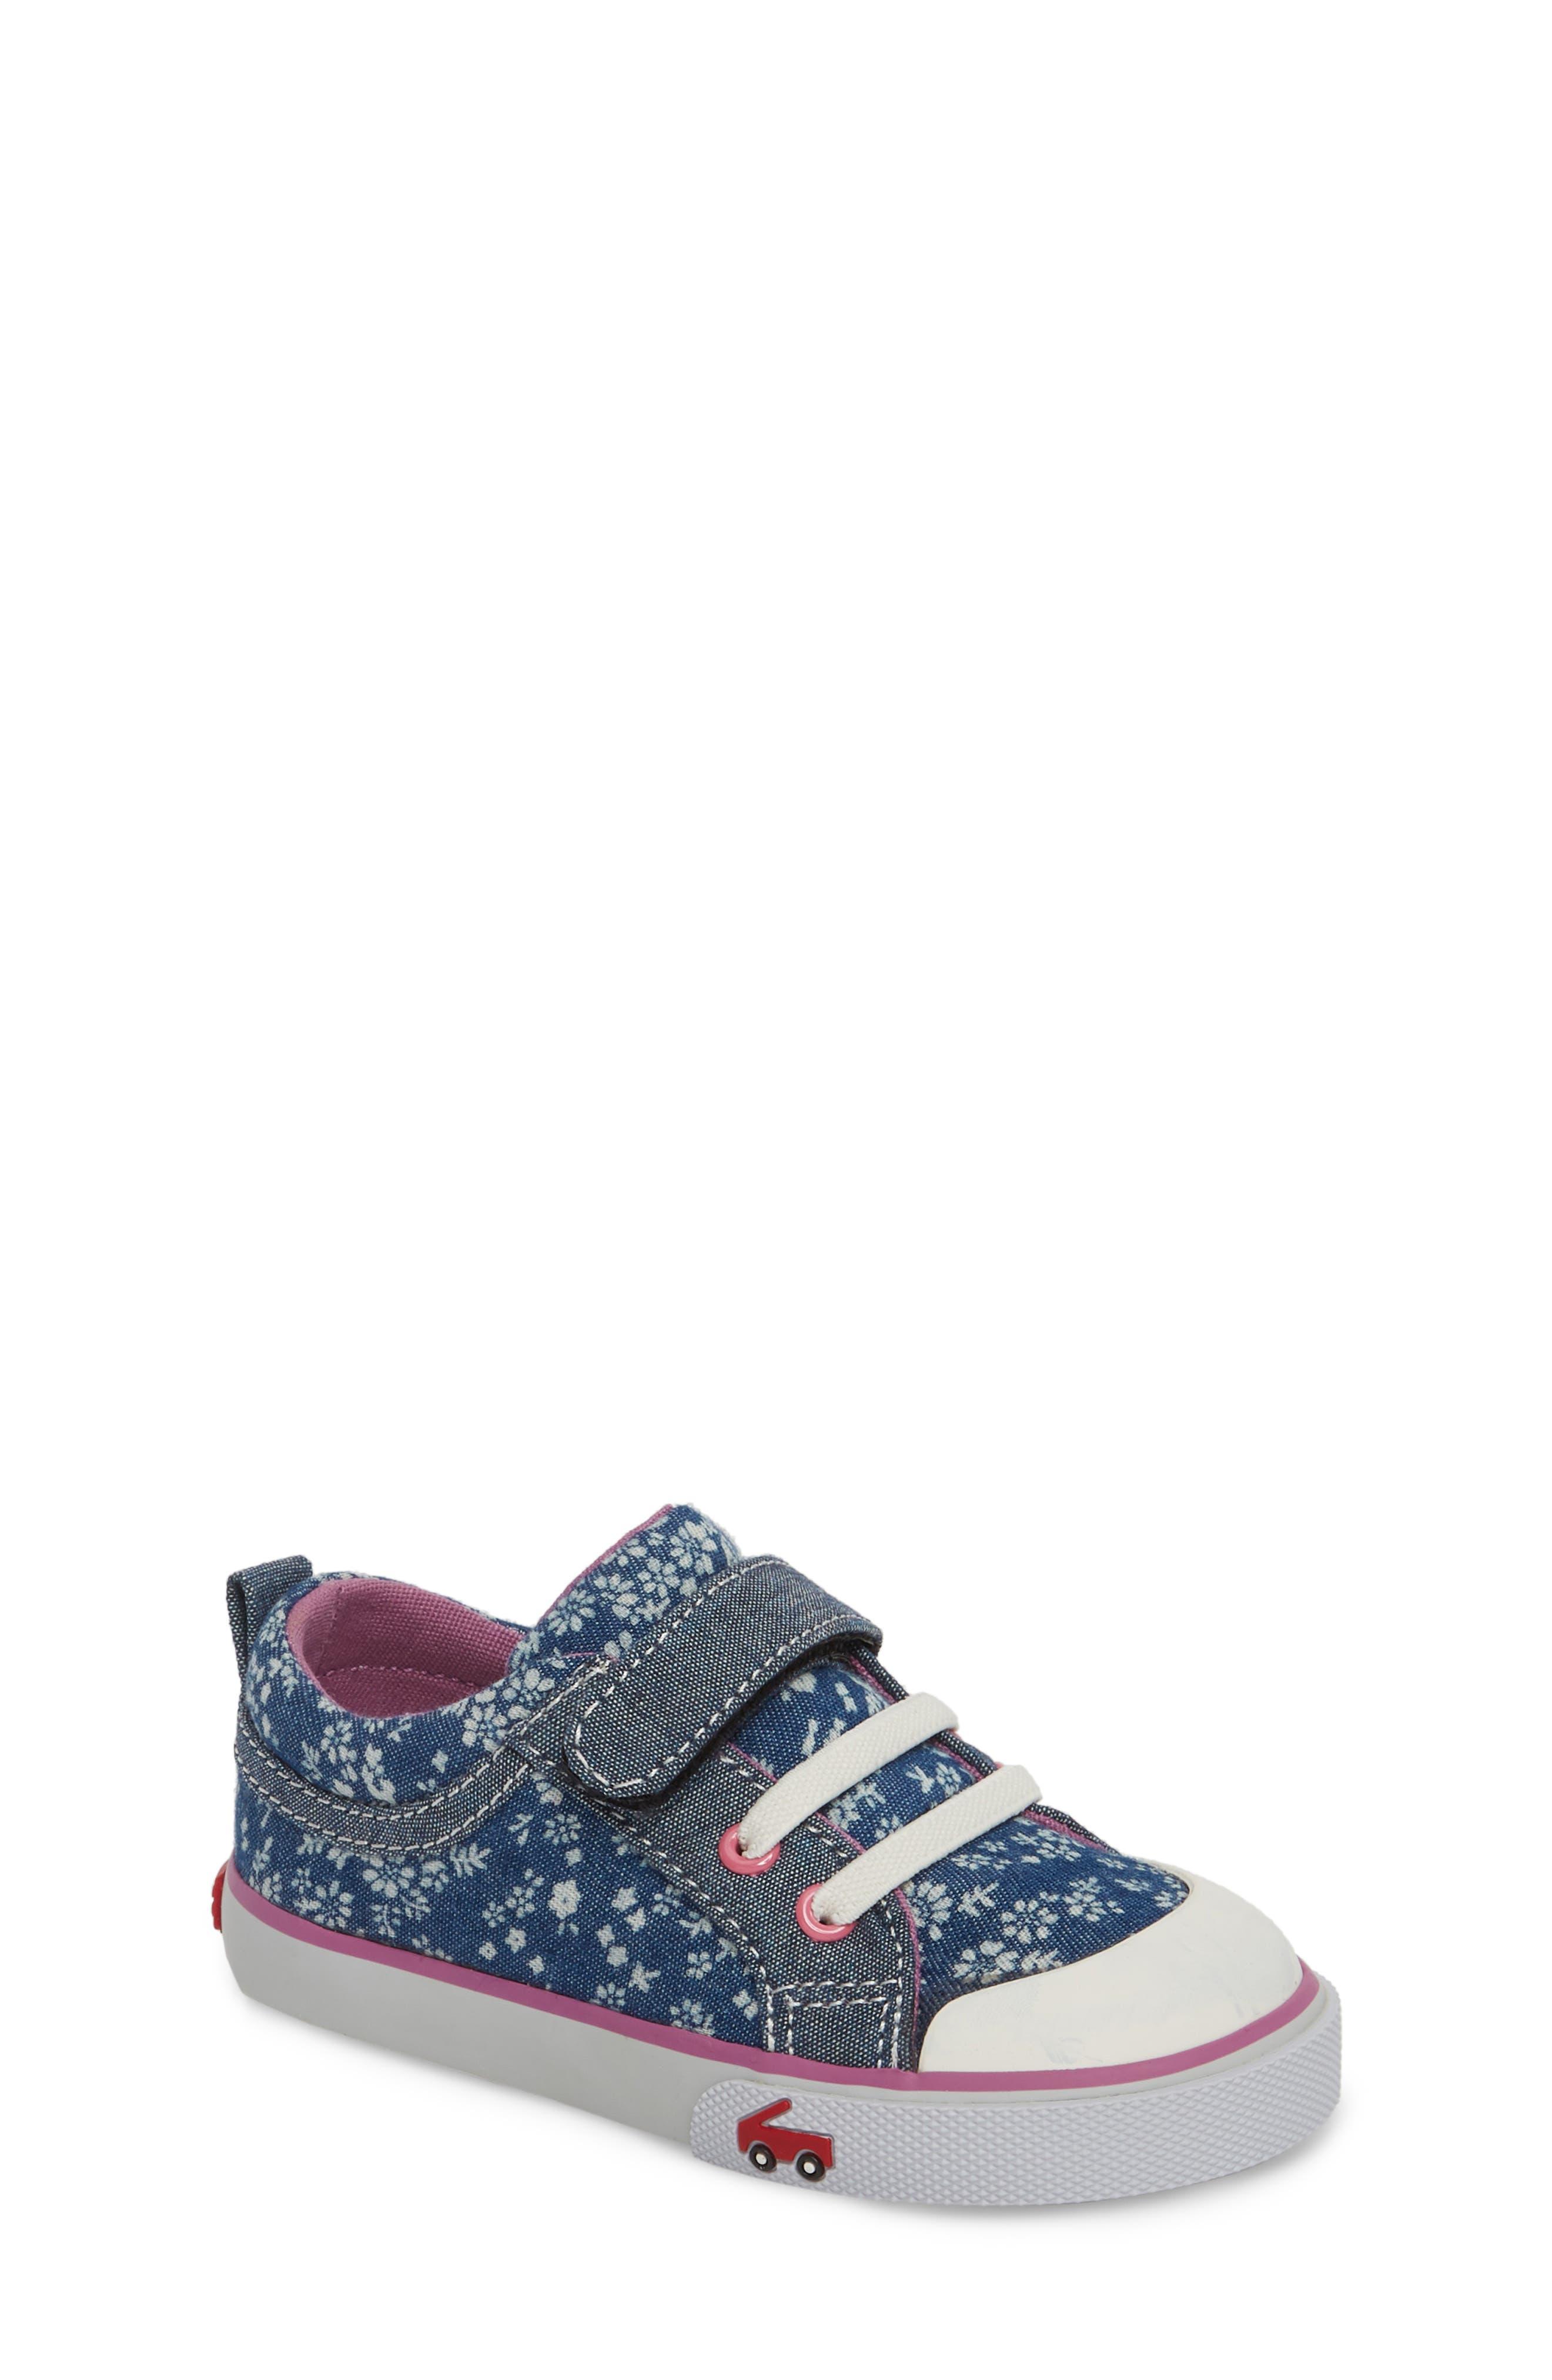 Kristin Sneaker,                             Main thumbnail 1, color,                             BLUE FLOWERS